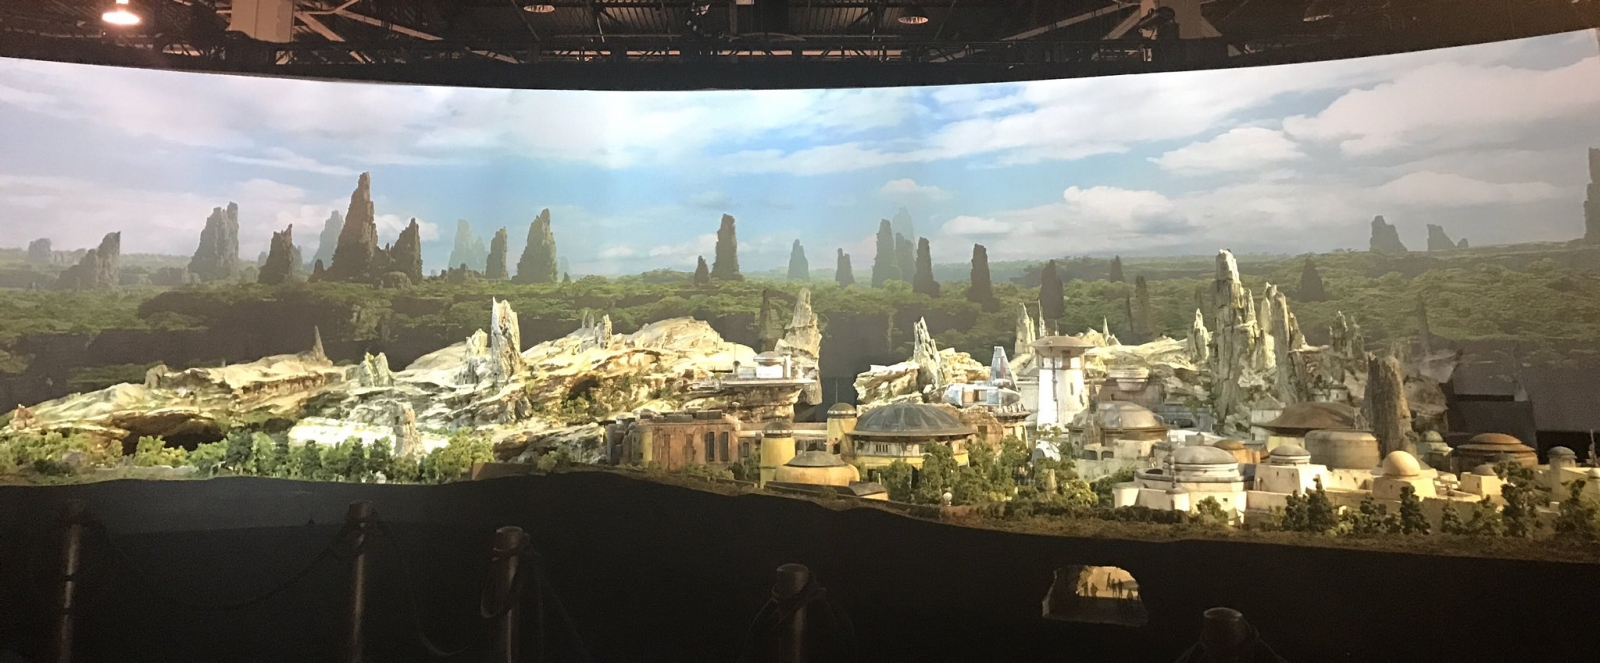 Disney Star Wars Theme Park model